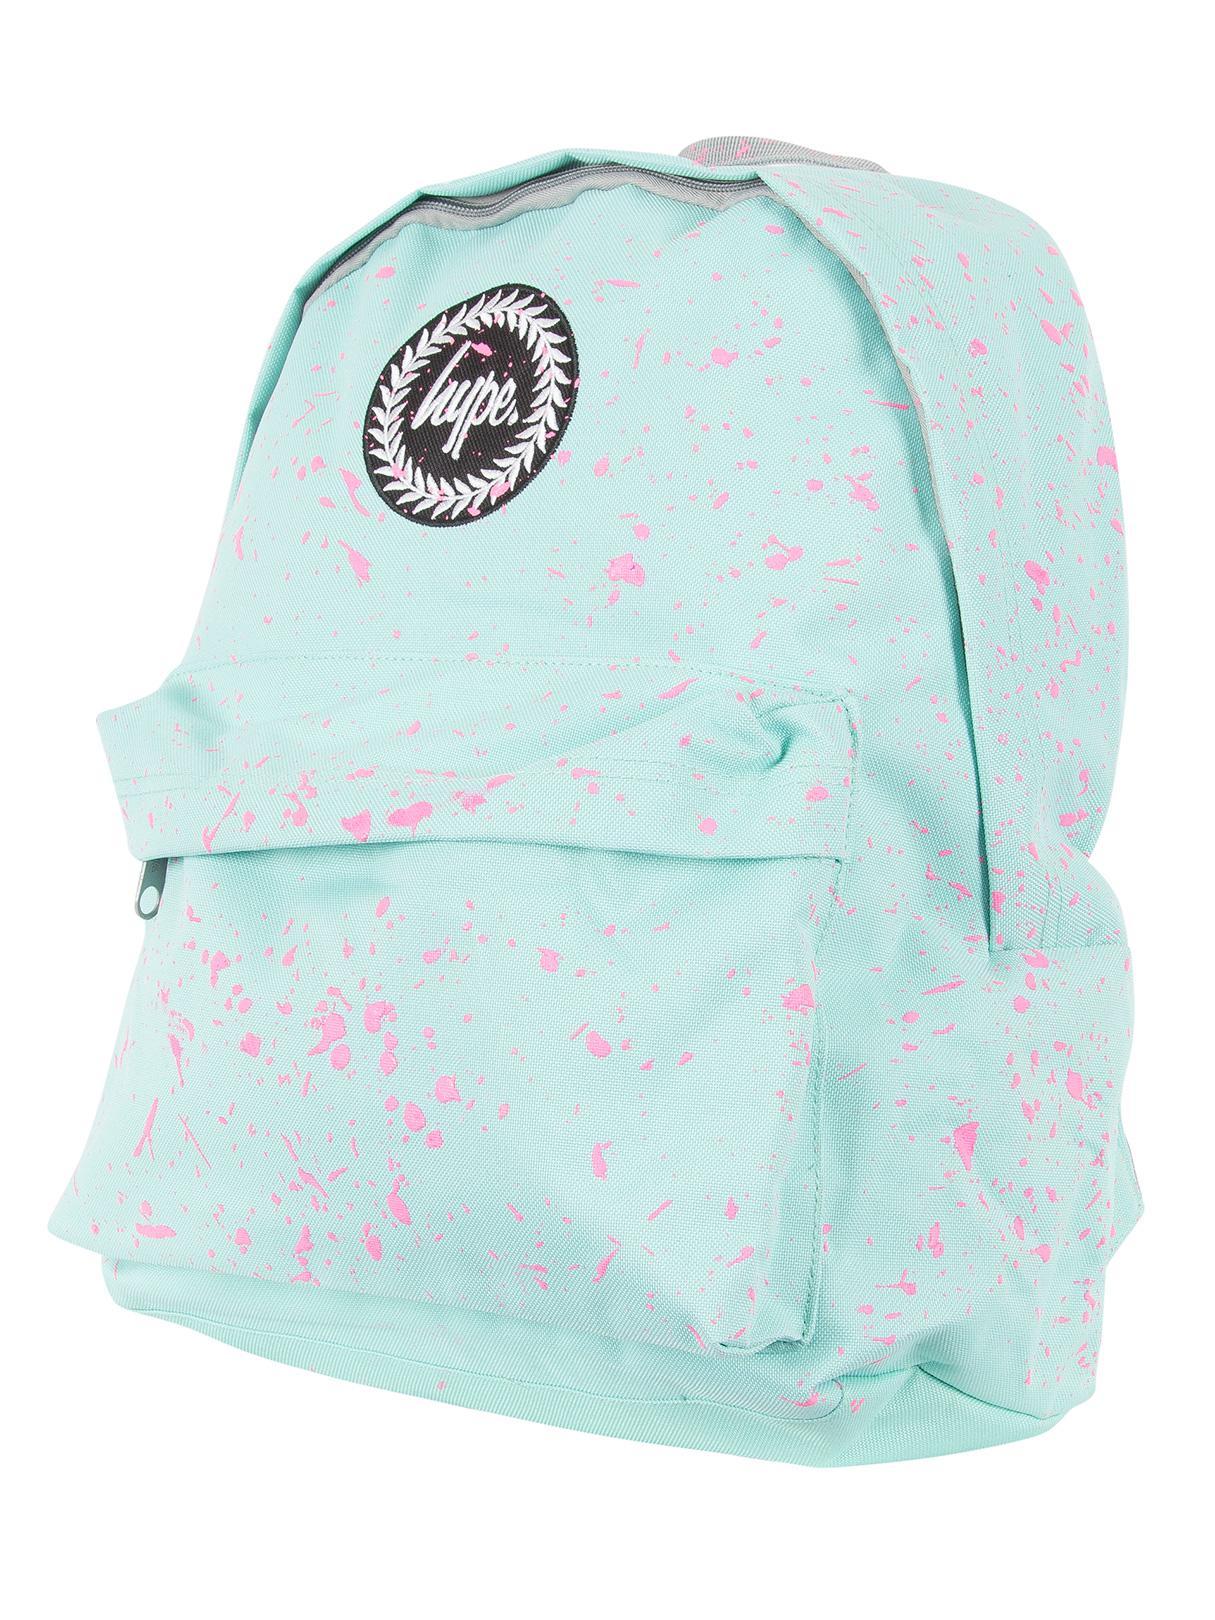 753cf8744f Vs Pink Backpack Mint- Fenix Toulouse Handball